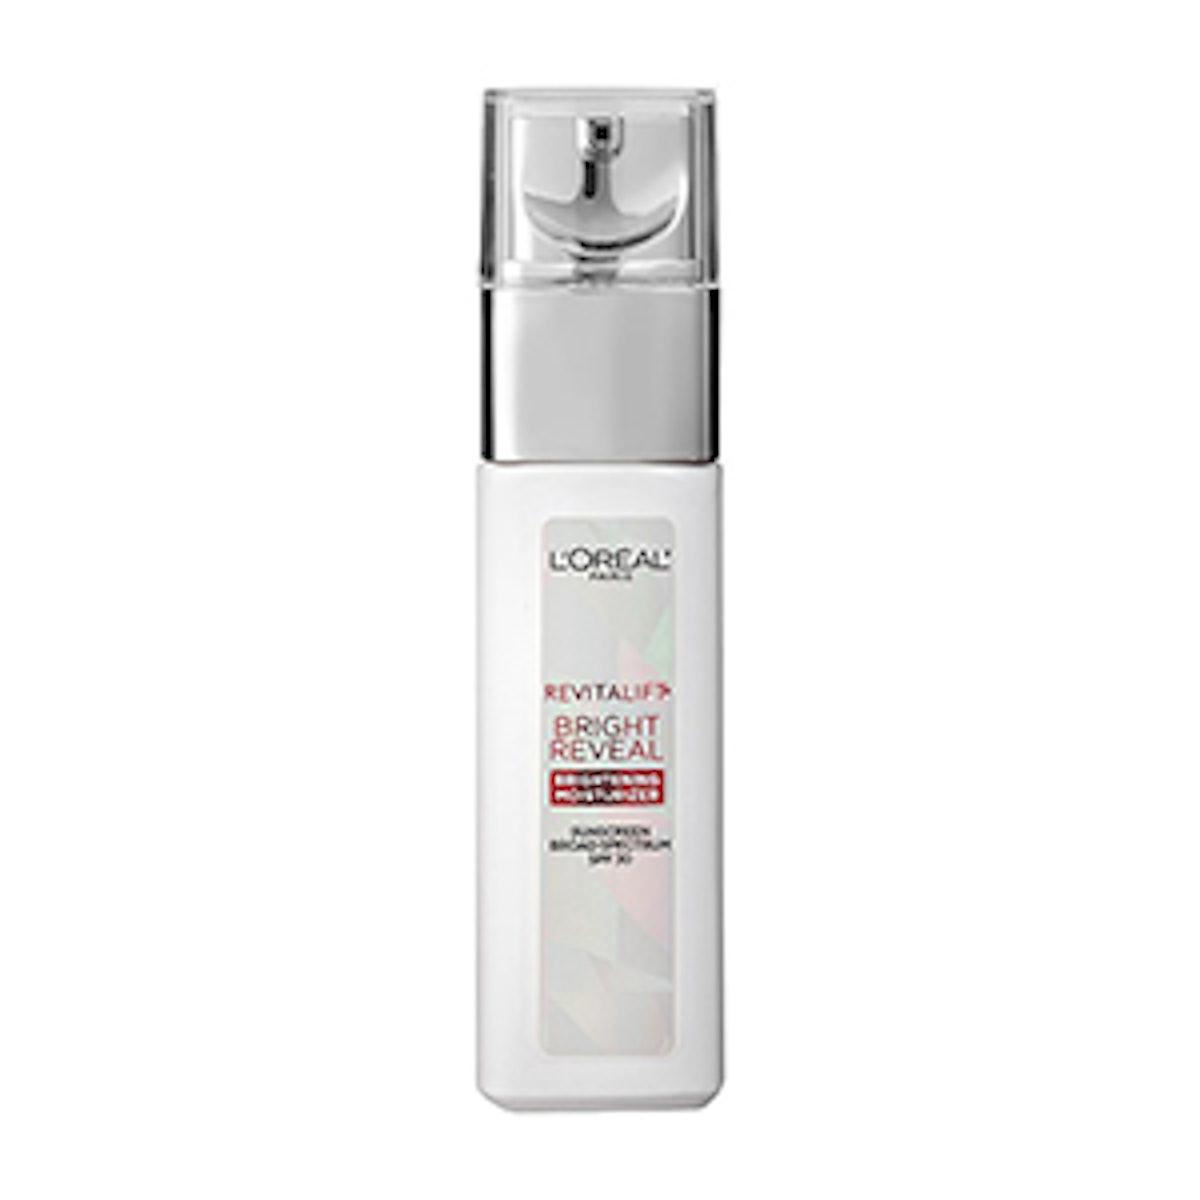 L'Oréal Revitalift Bright Reveal SPF Moisturizer